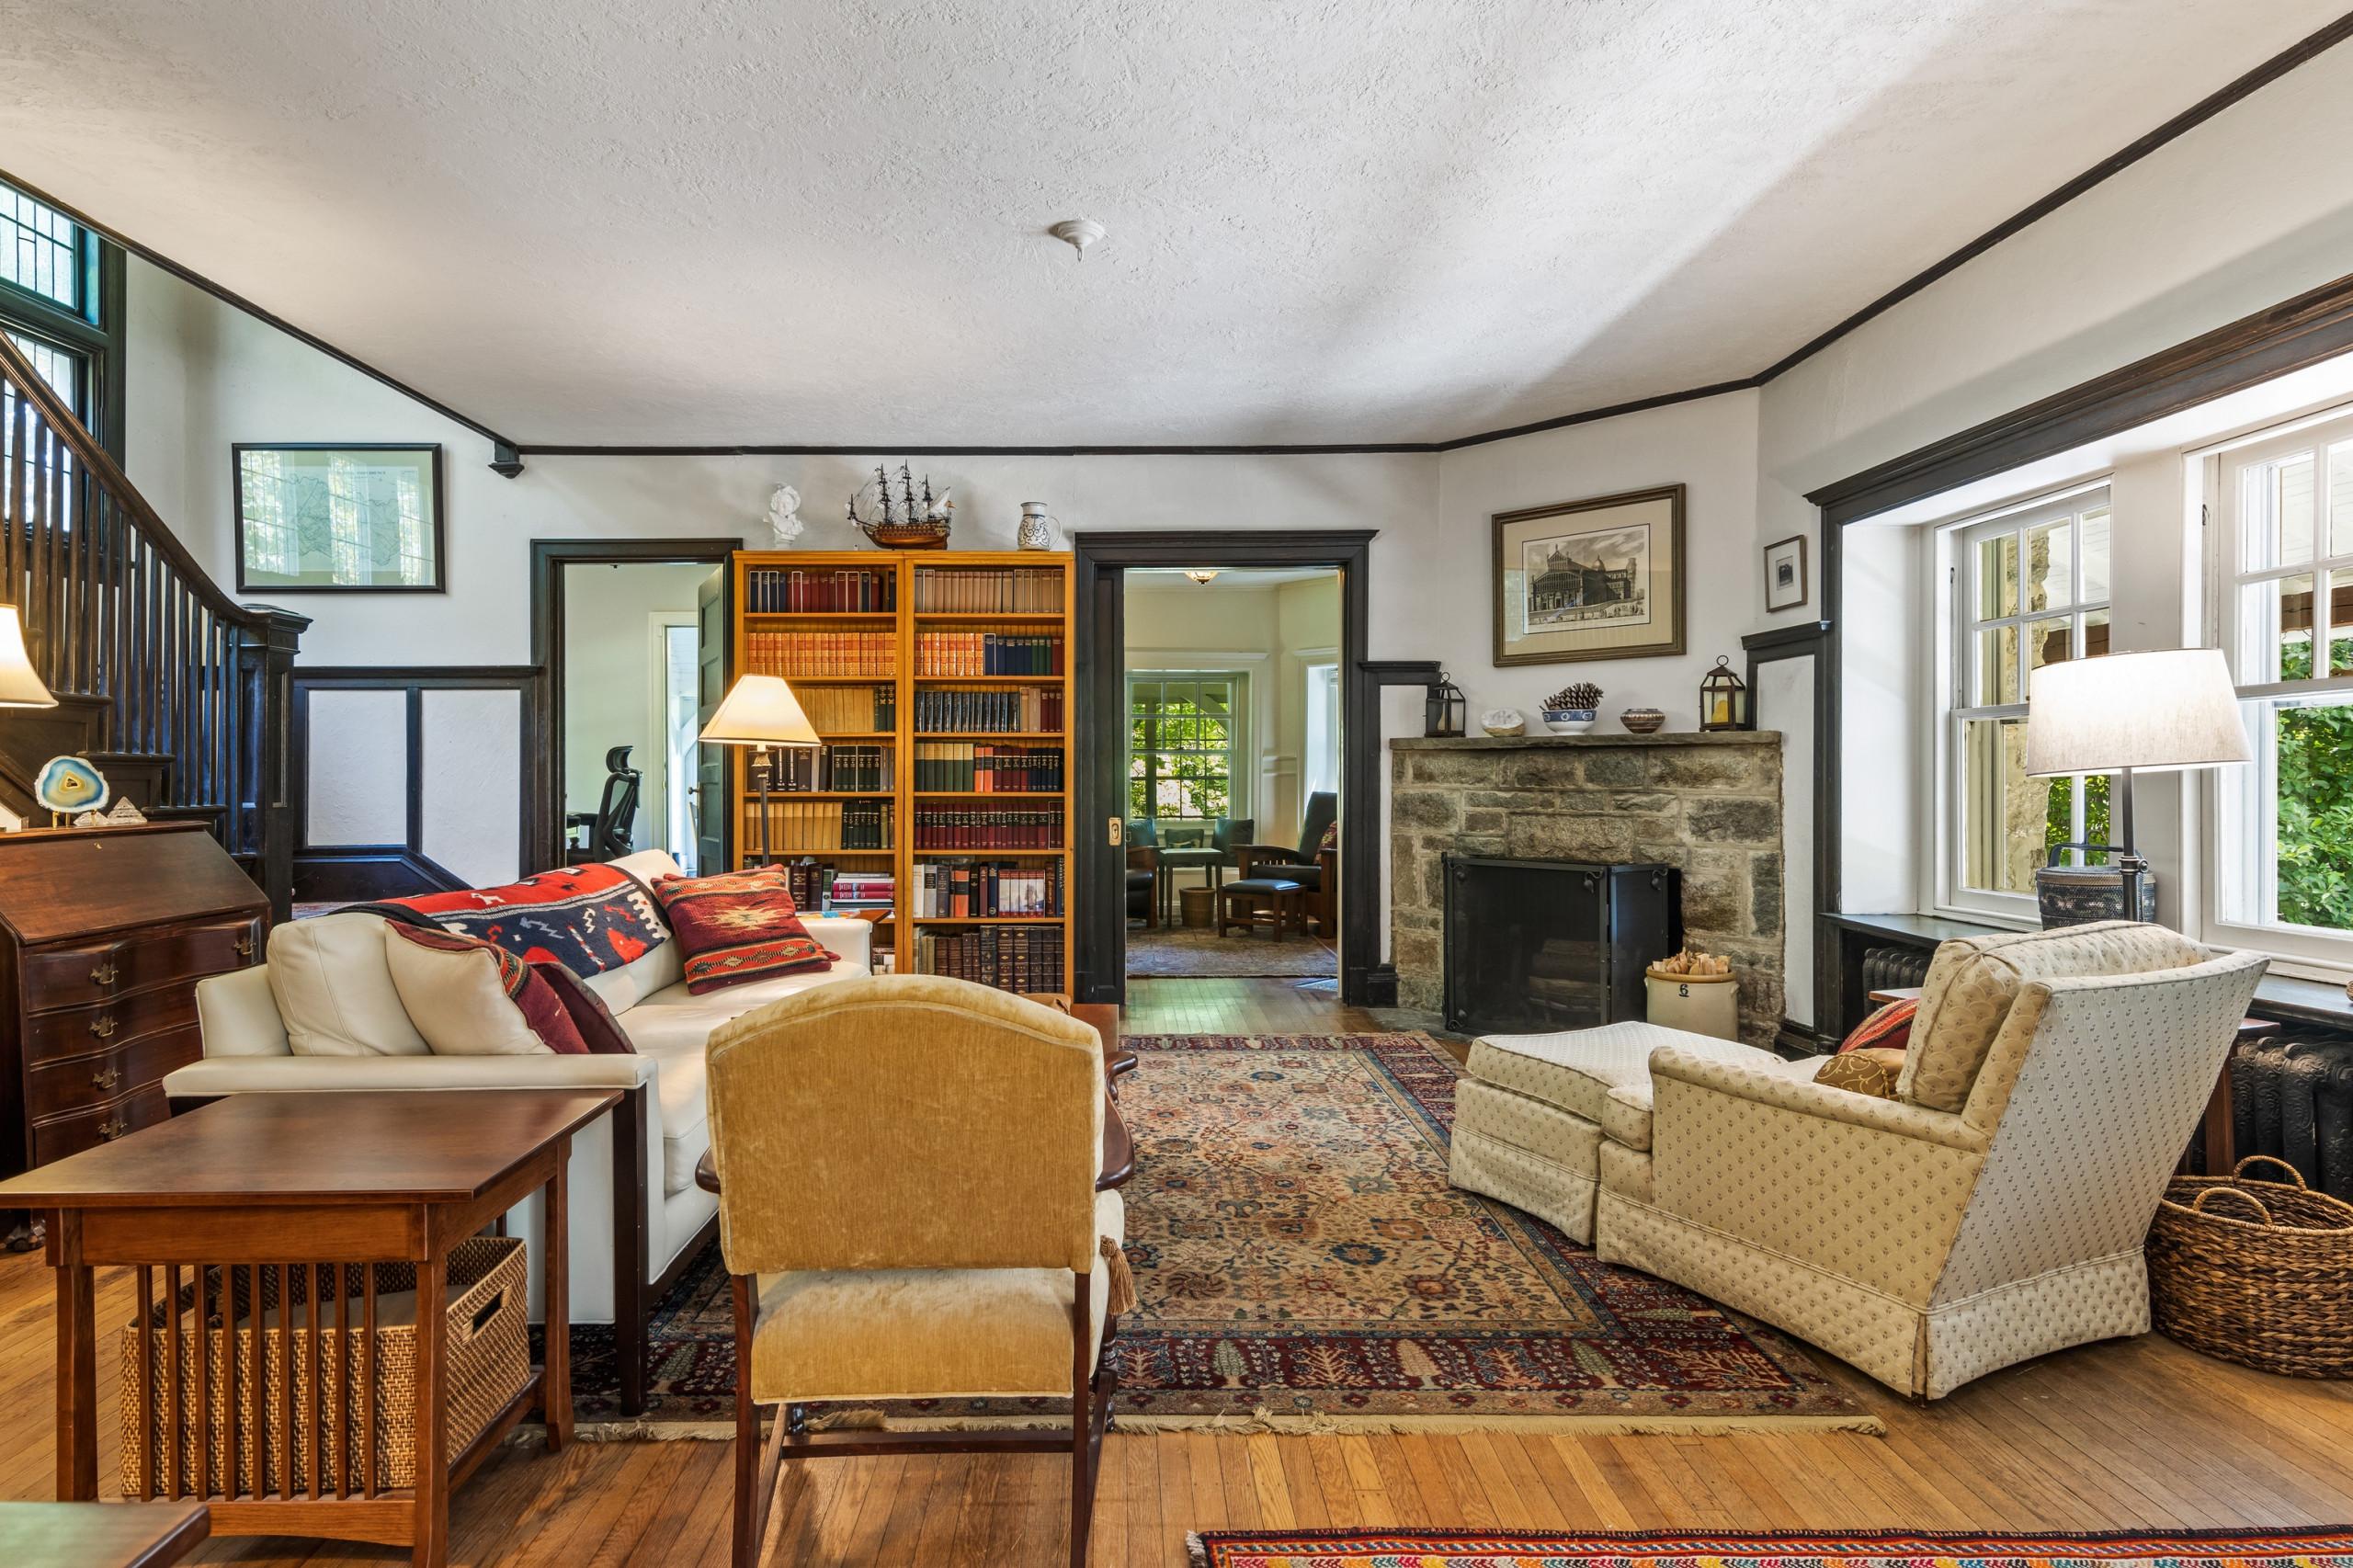 house for sale Wallingford creekside living room